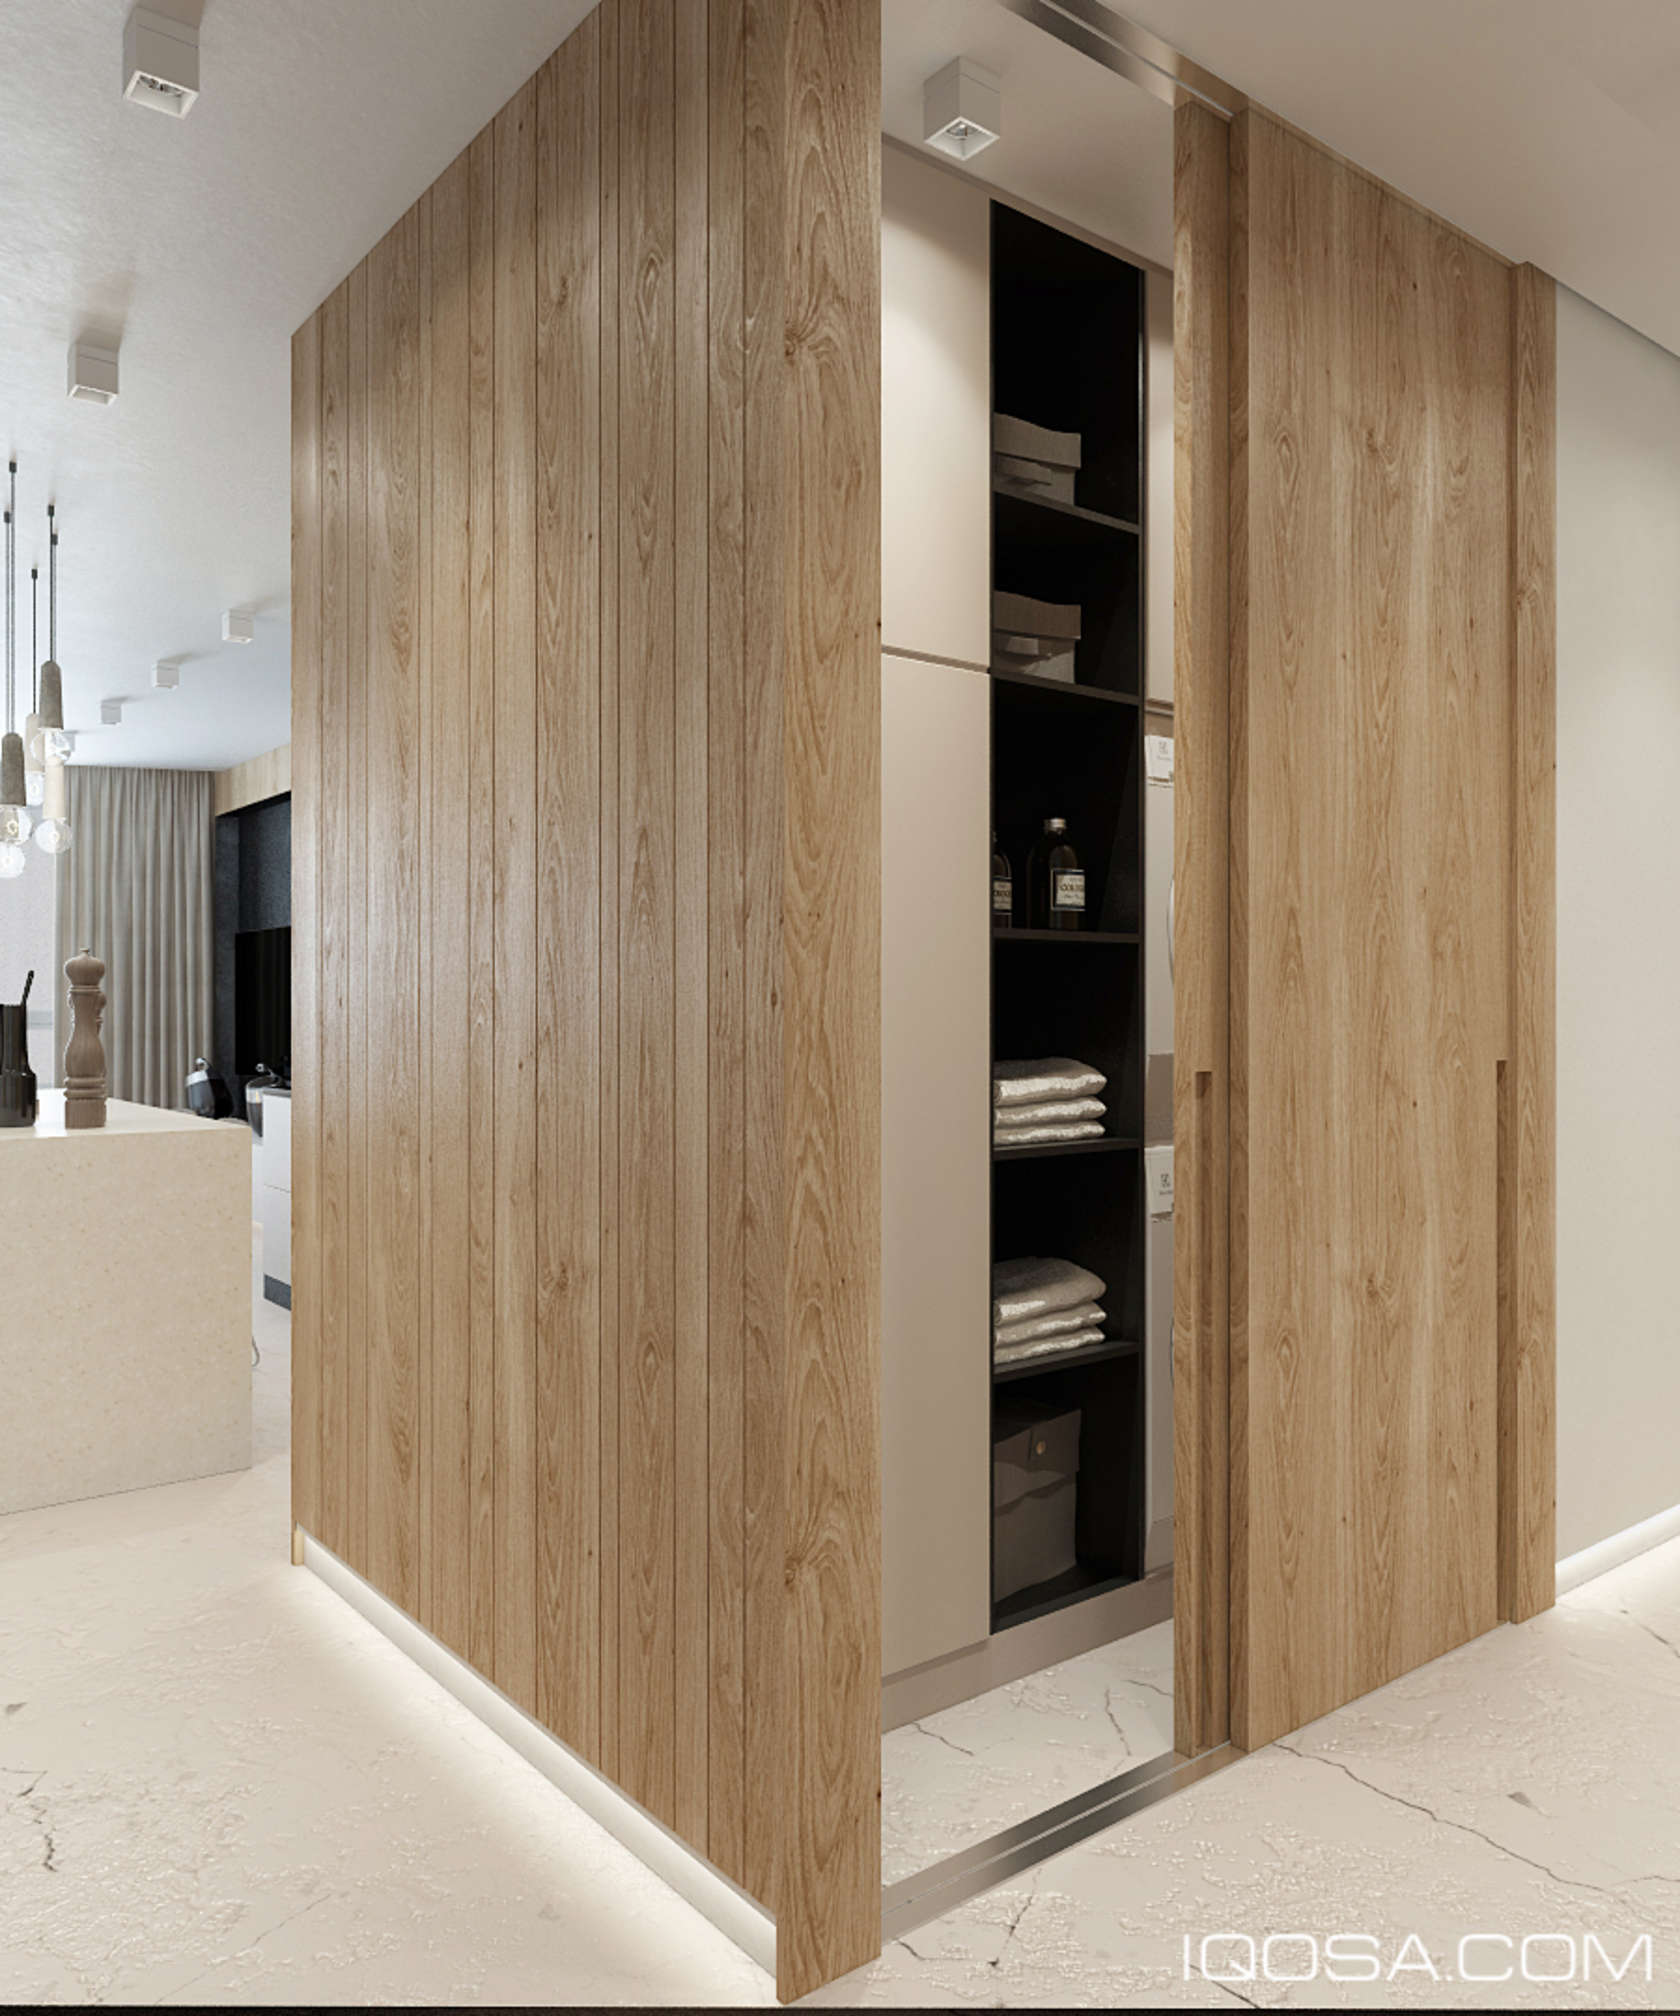 Wood apartment decorating ideas